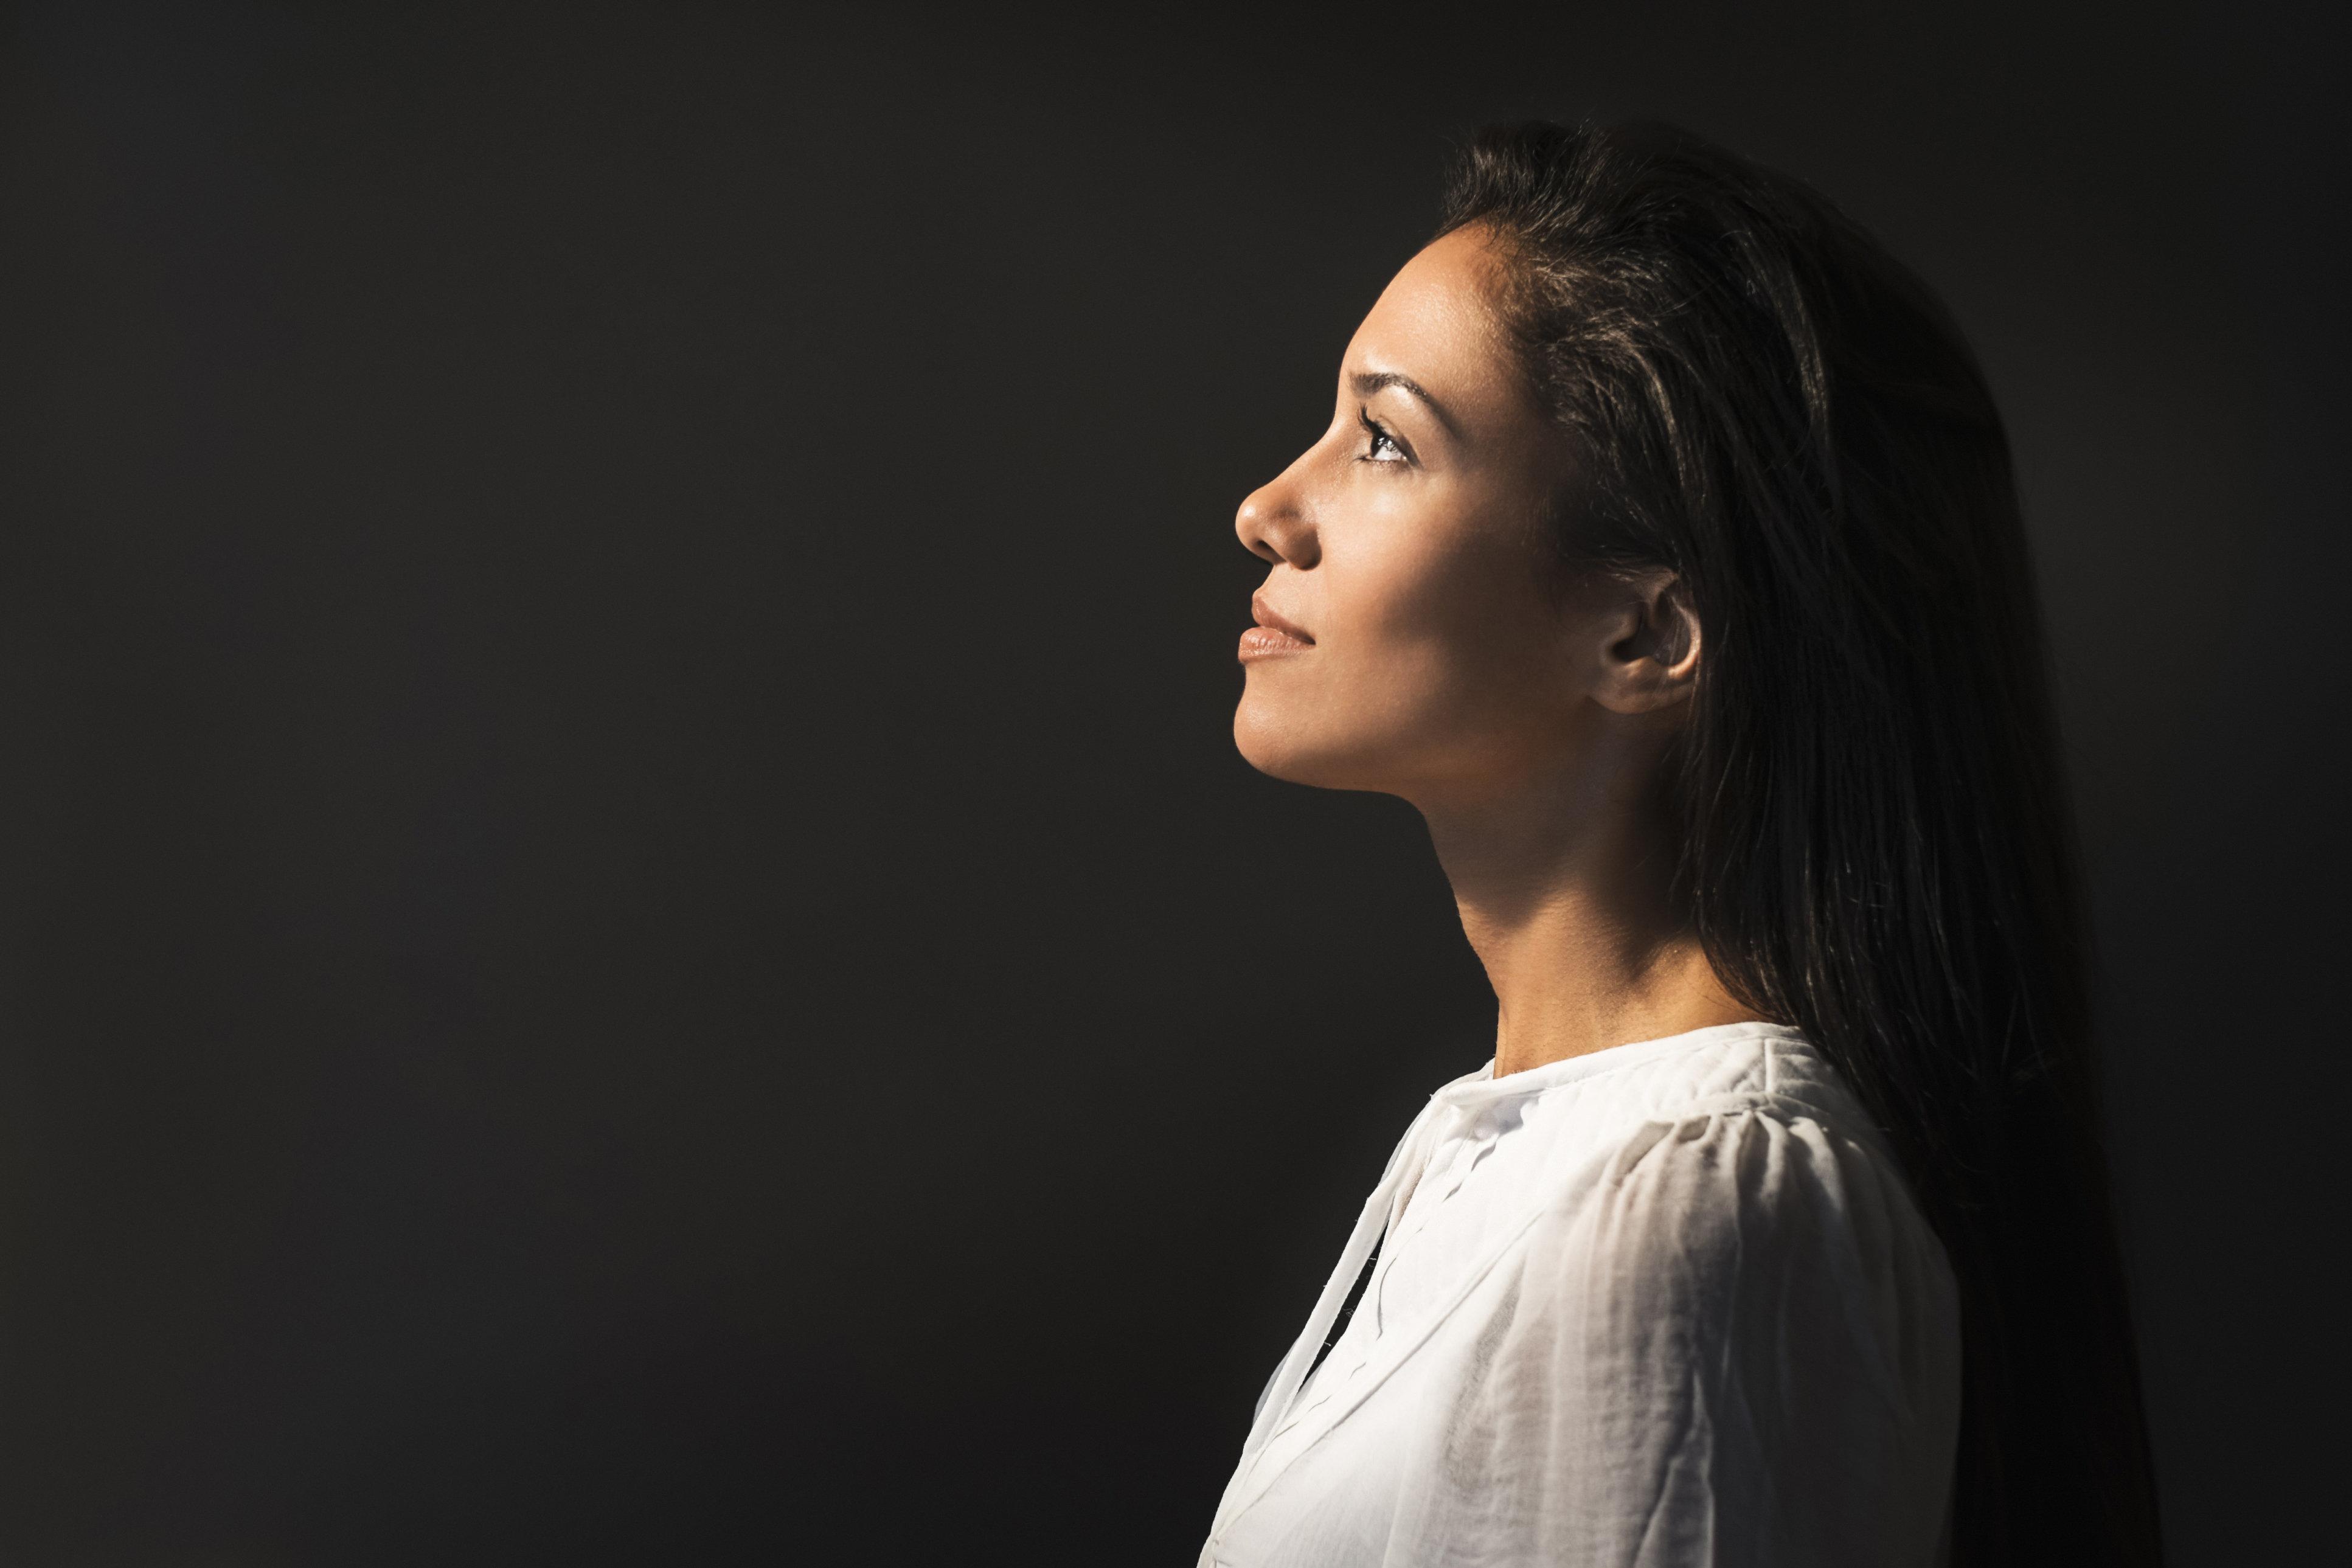 Hispanic woman looking up into light